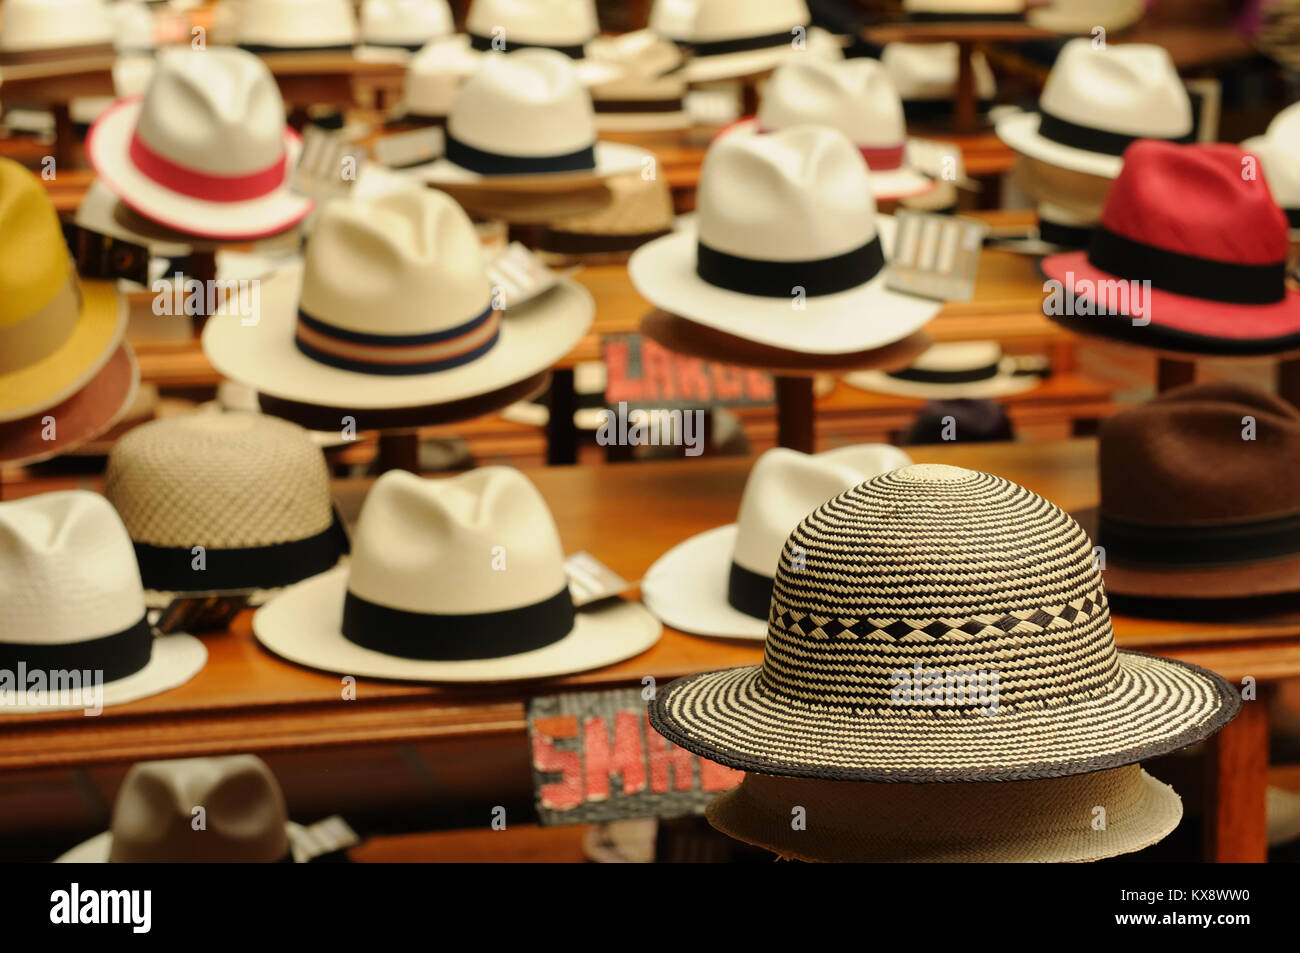 Ecuador Panama Hats Imágenes De Stock   Ecuador Panama Hats Fotos De ... dcc023cdcfe